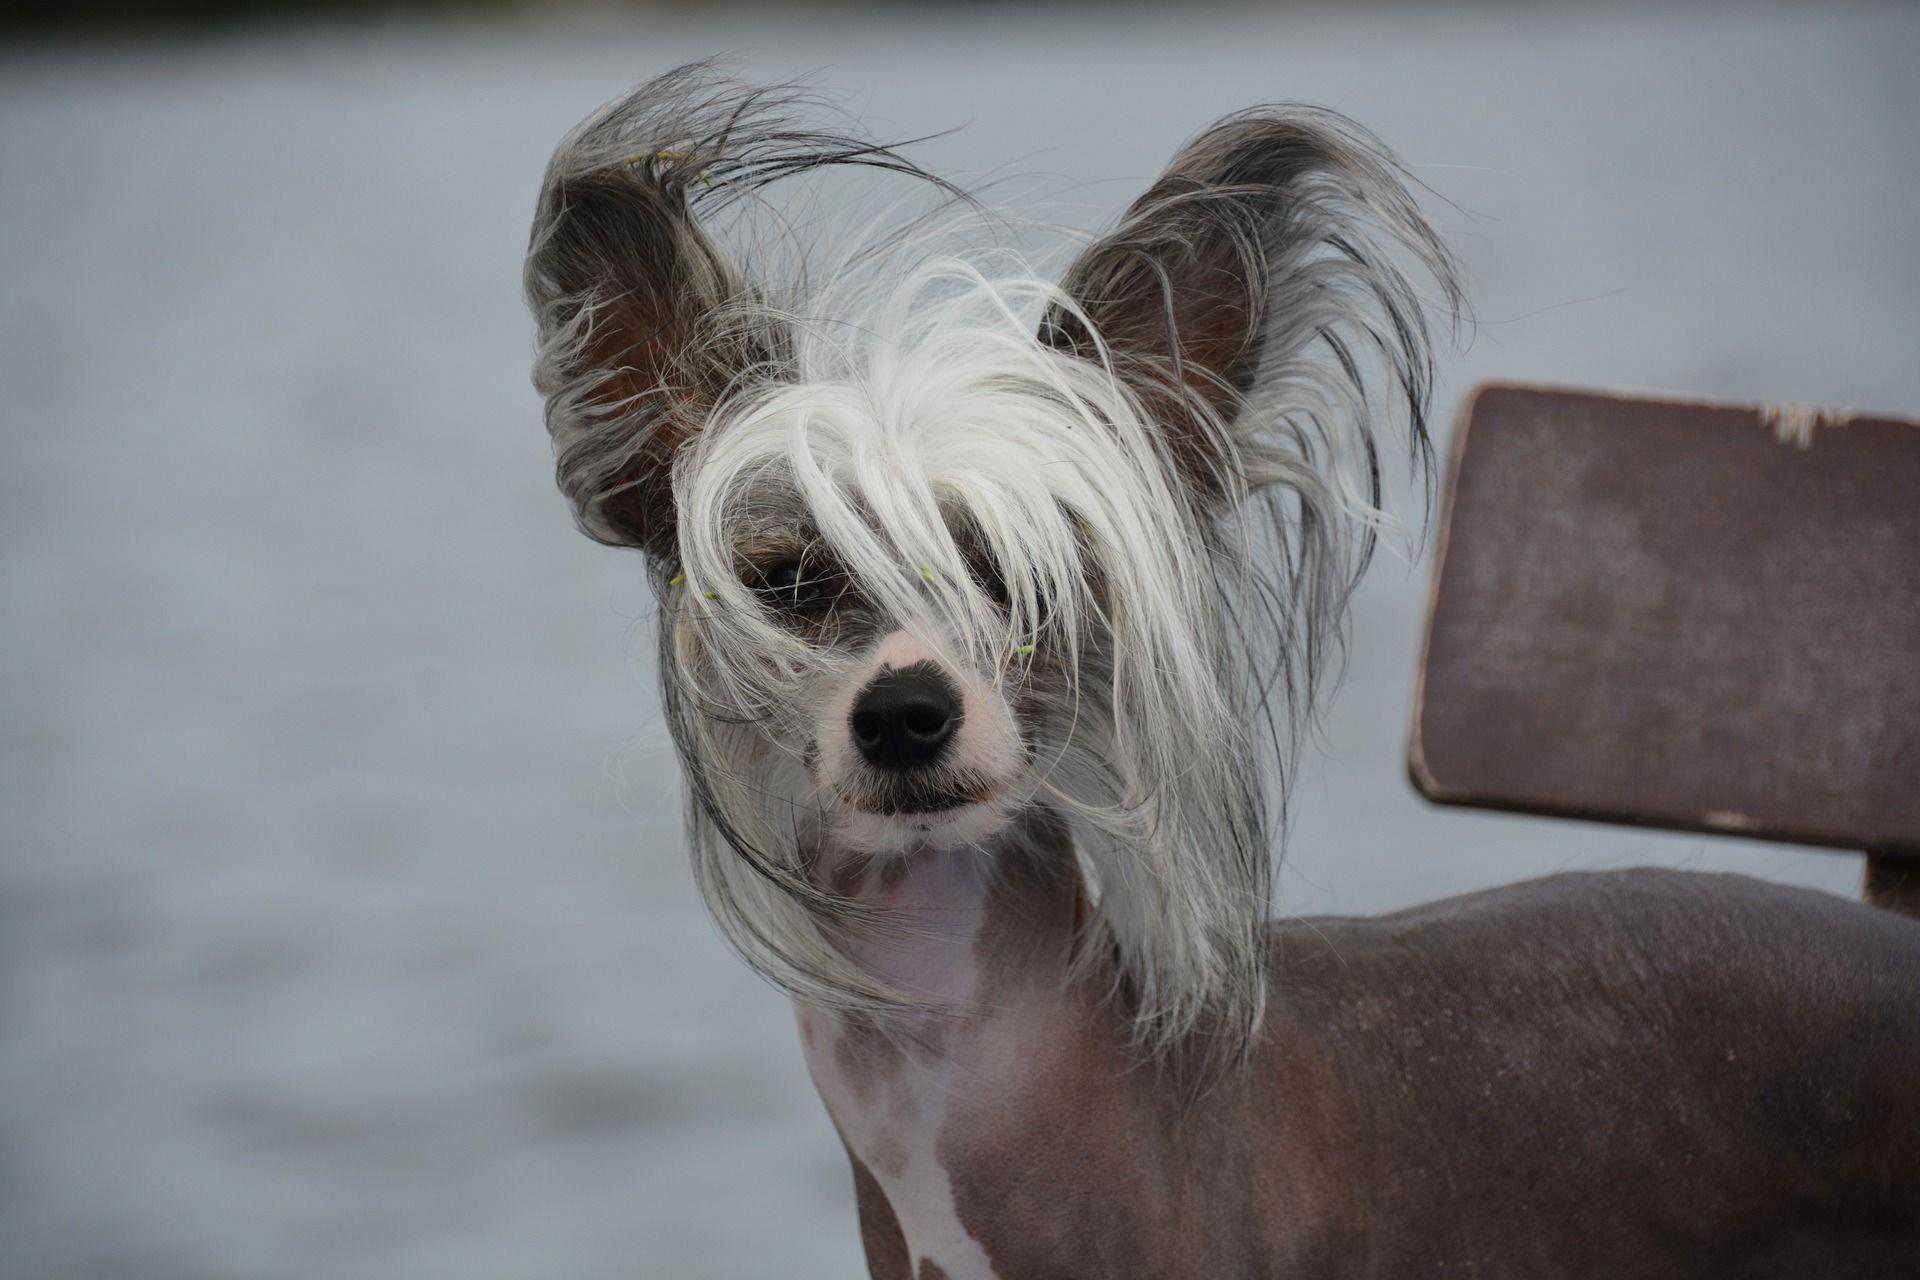 Голая китайскай хохлатая собака